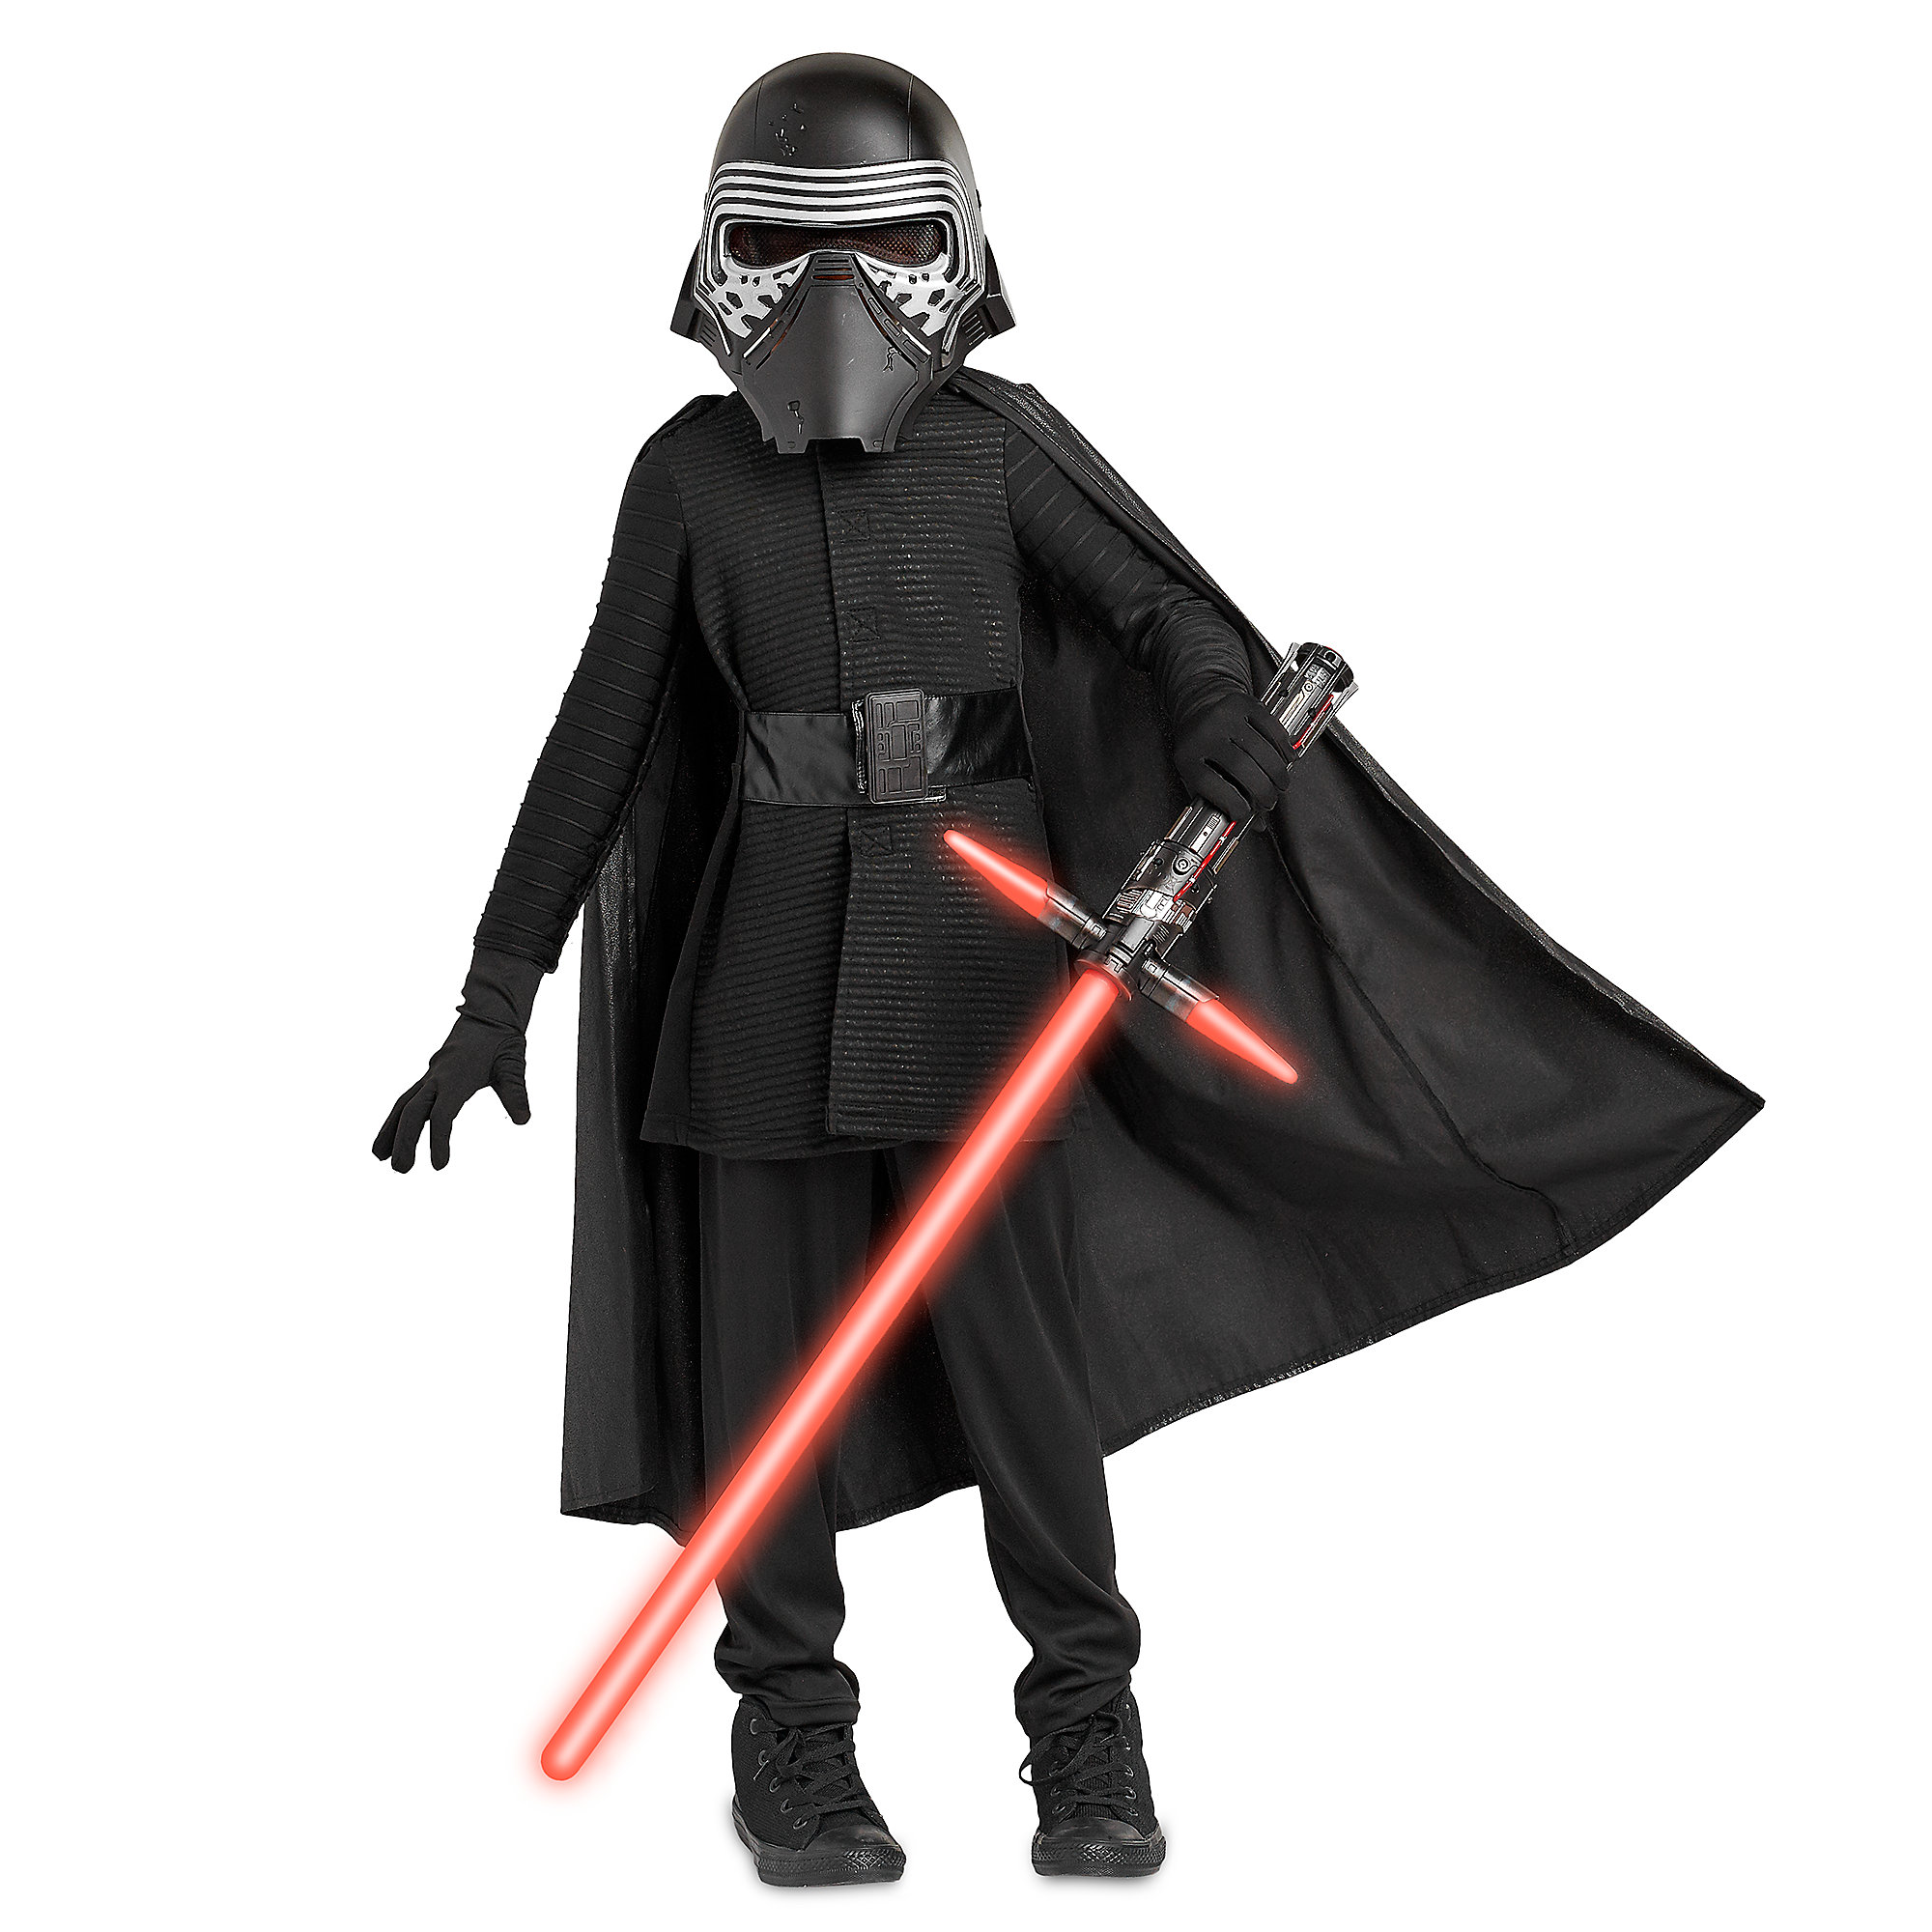 Thumbnail Image of Kylo Ren Costume for Kids - Star Wars The Last Jedi #  sc 1 st  shopDisney & Kylo Ren Costume for Kids - Star Wars: The Last Jedi   shopDisney